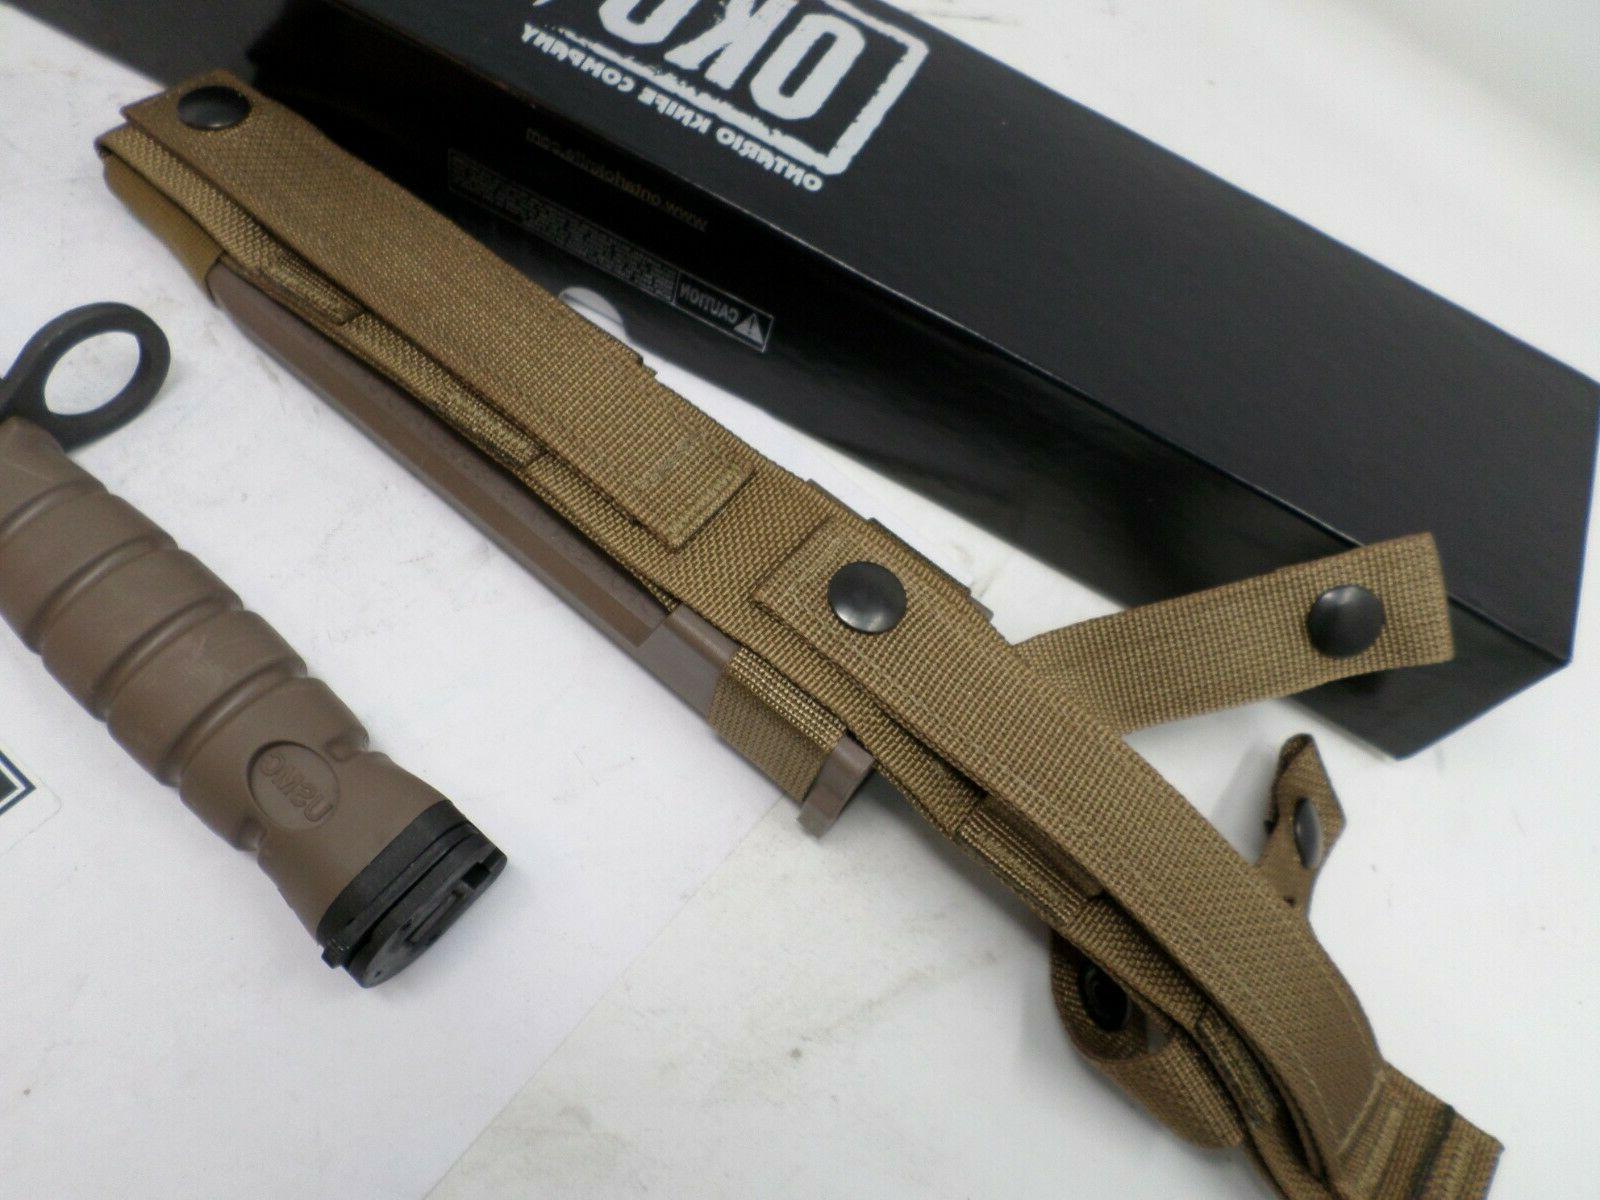 Corps Ontario 3S Combat Knife